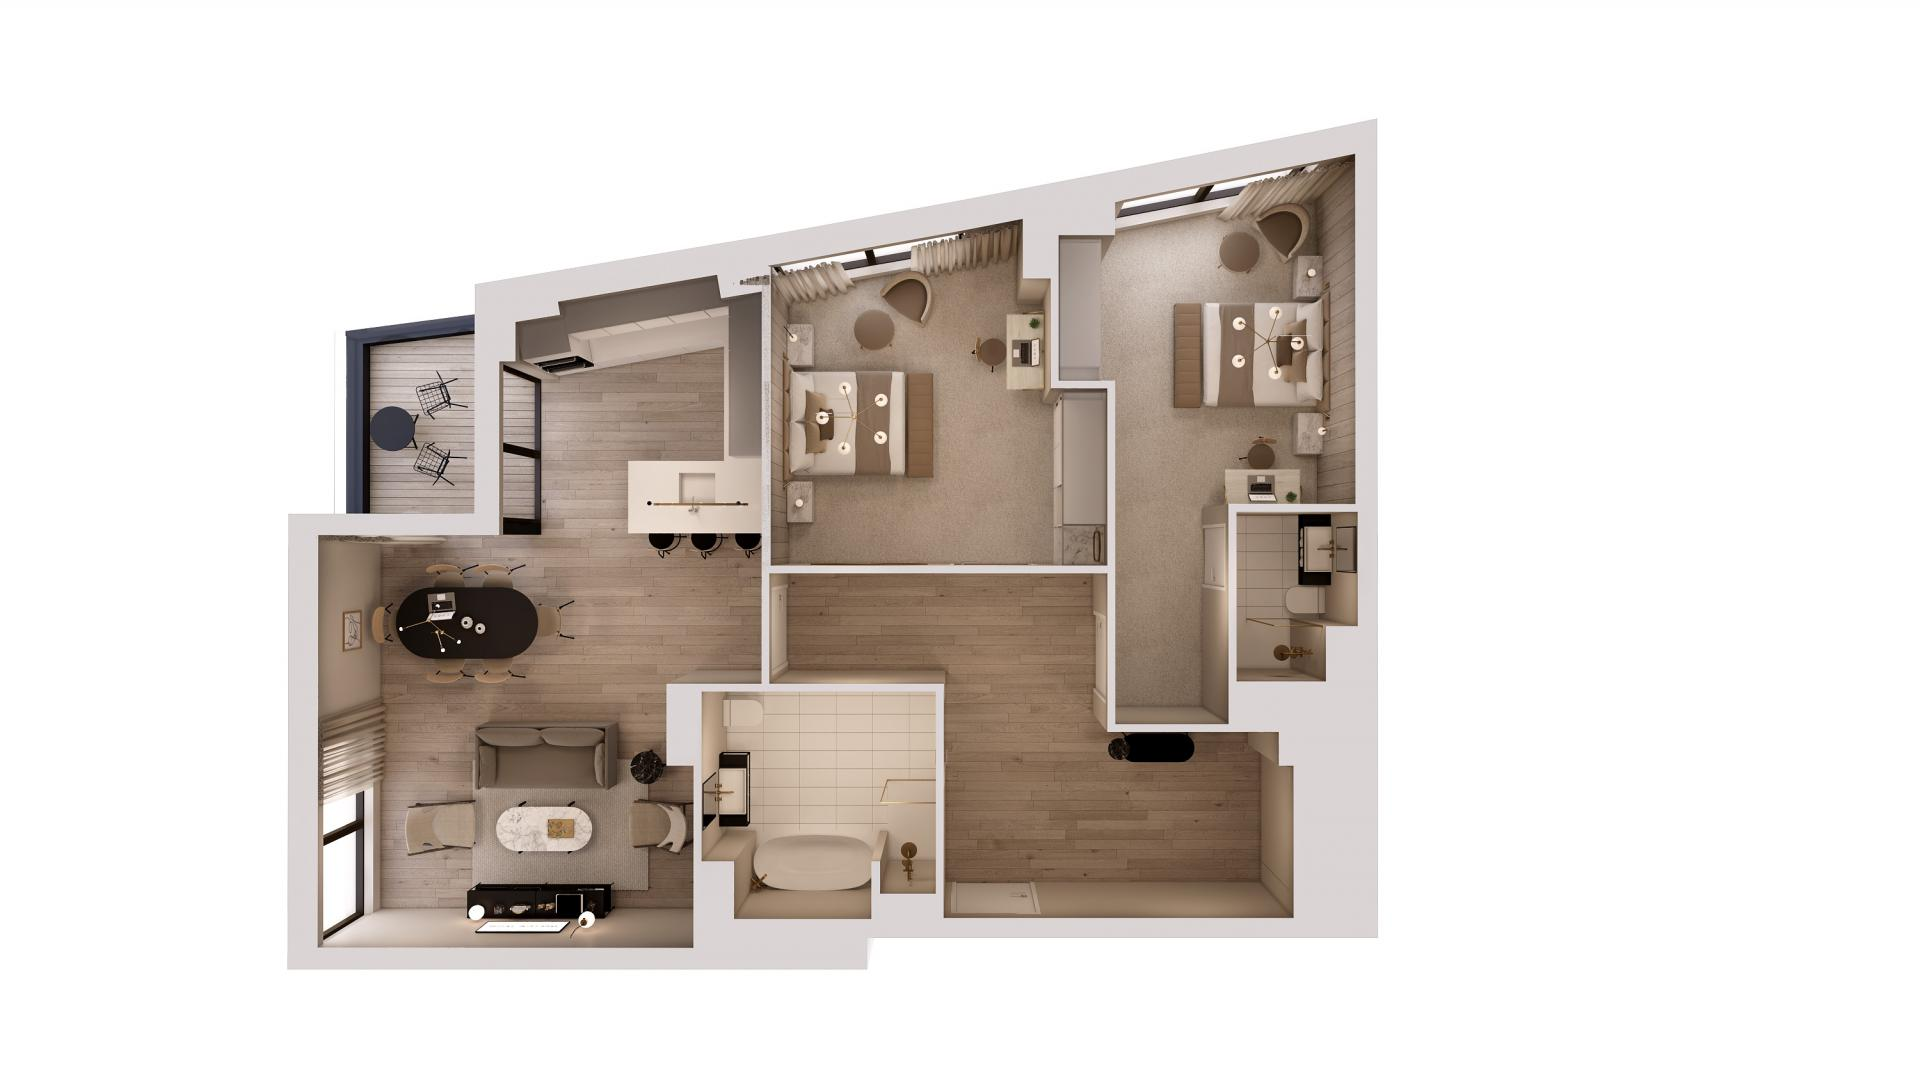 2 bed 2 bath variation floor plan at STAY Camden Serviced Apartments, Camden, London